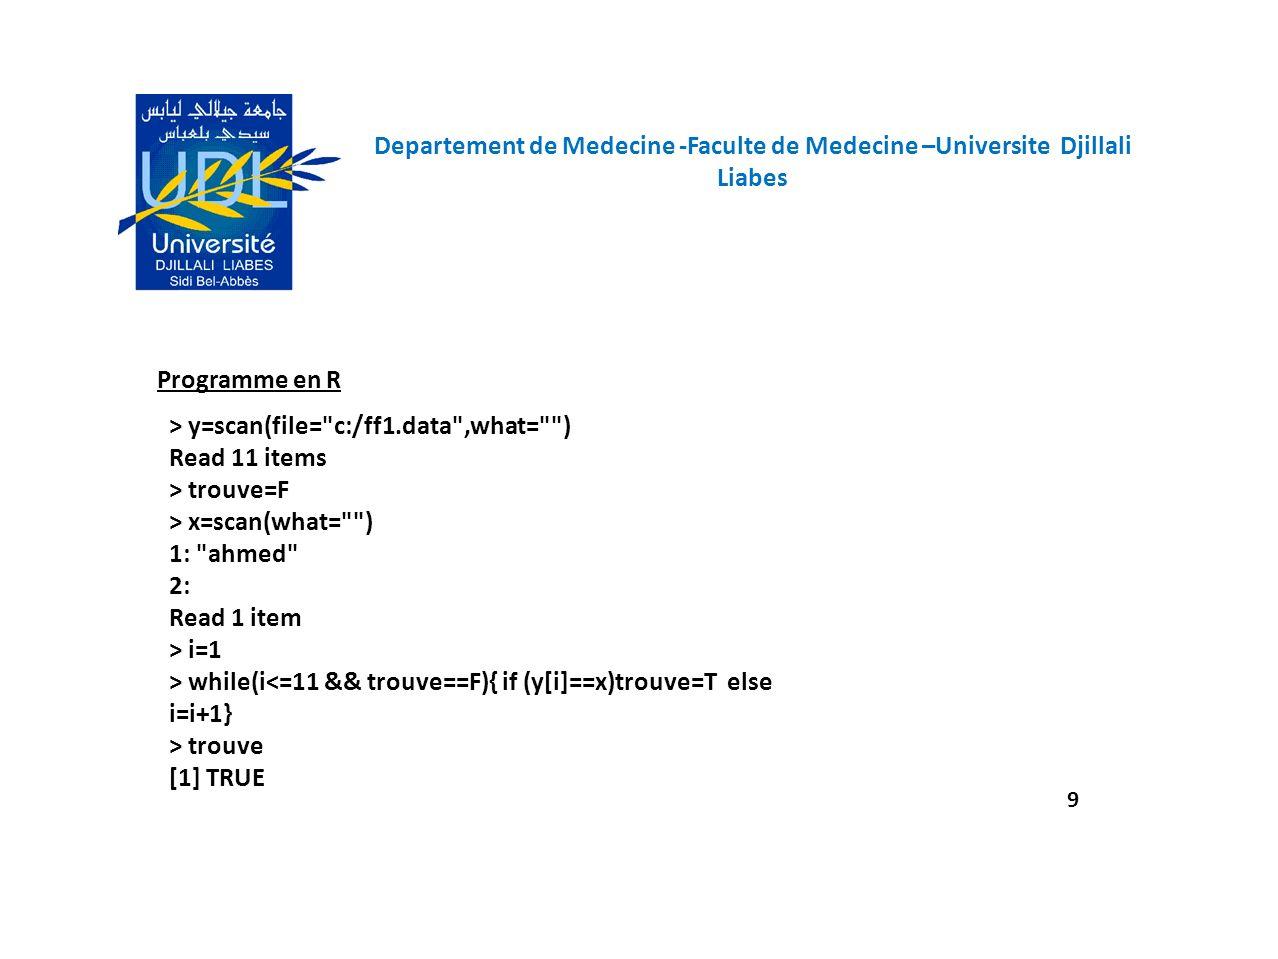 Departement de Medecine -Faculte de Medecine –Universite Djillali Liabes 9 Programme en R > y=scan(file=